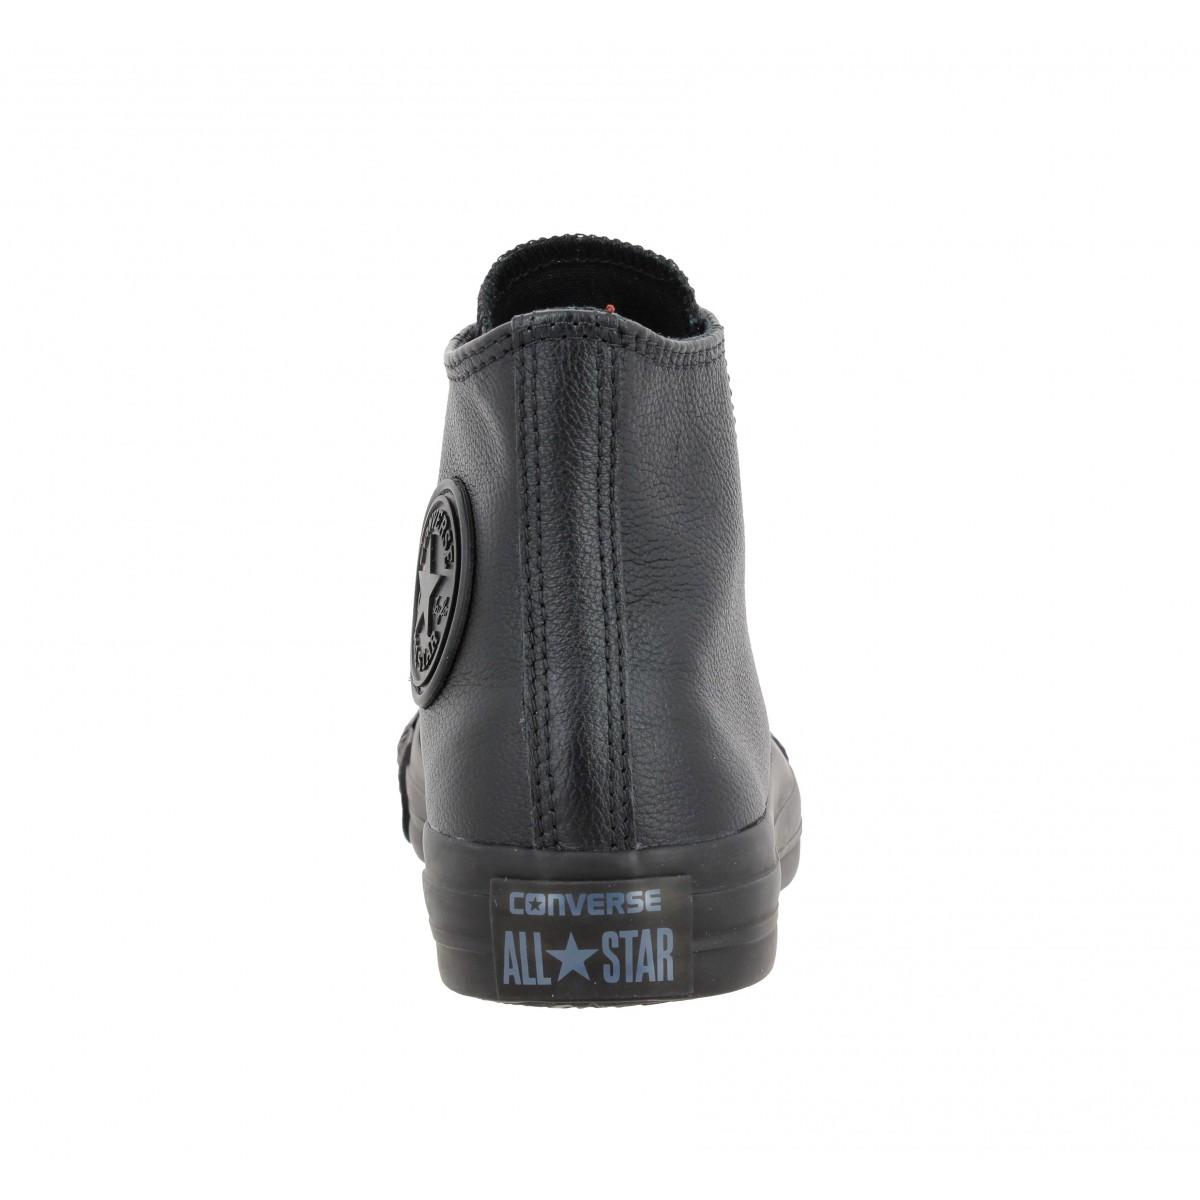 Chaussures Converse chuck taylor all star hi cuir femme noir ...